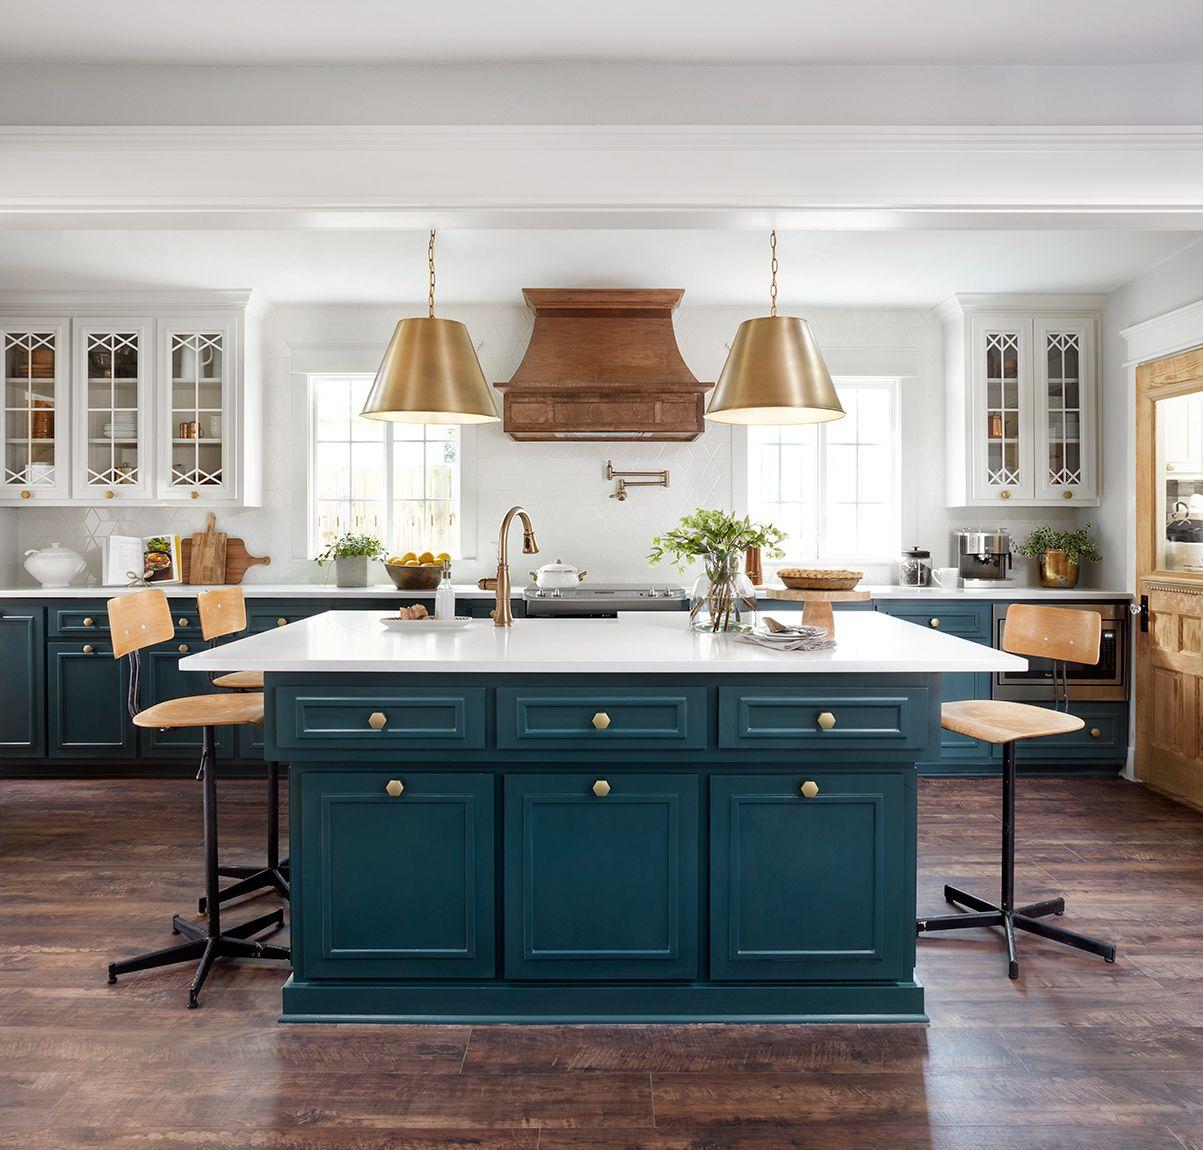 Episode 8 Season 5 Hgtv S Fixer Upper Chip Jo Gaines Kitchen Remodel Small Farmhouse Kitchen Remodel New Kitchen Cabinets